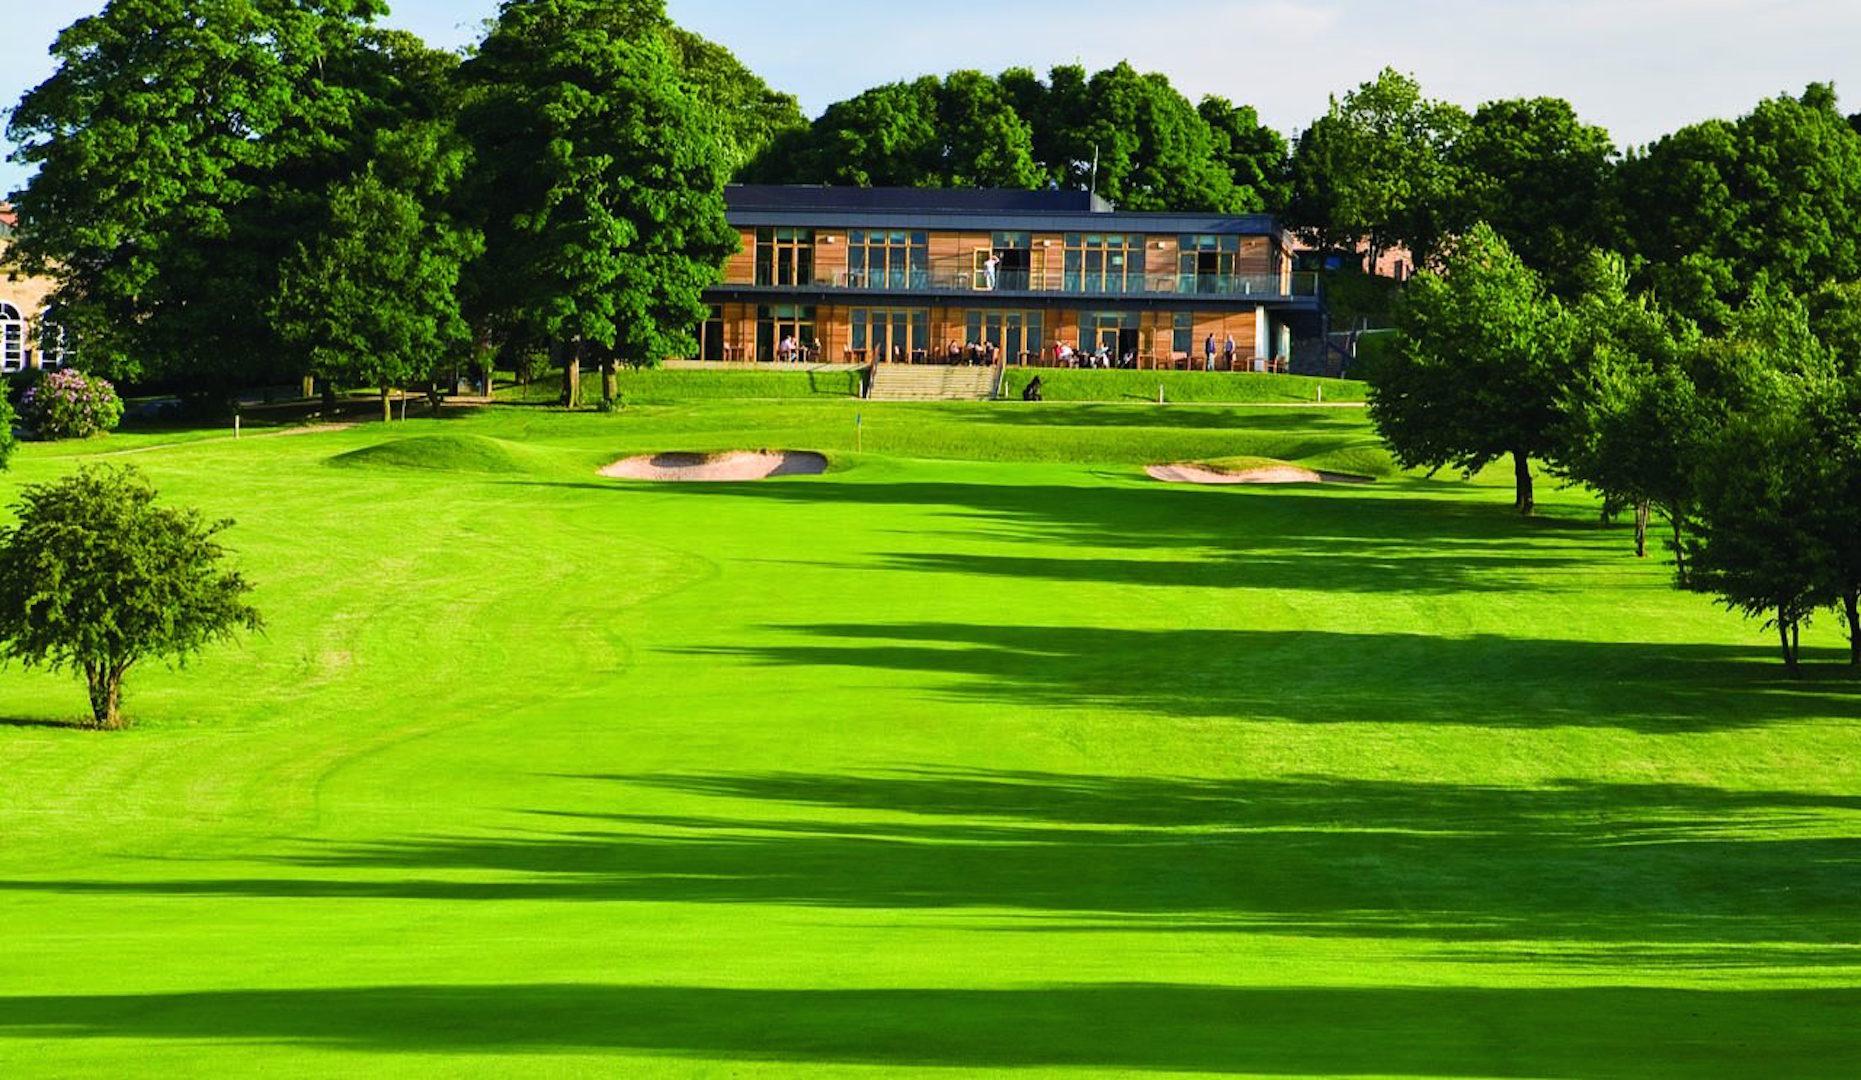 Golf World – #Helpthegravy & #bunchofarse